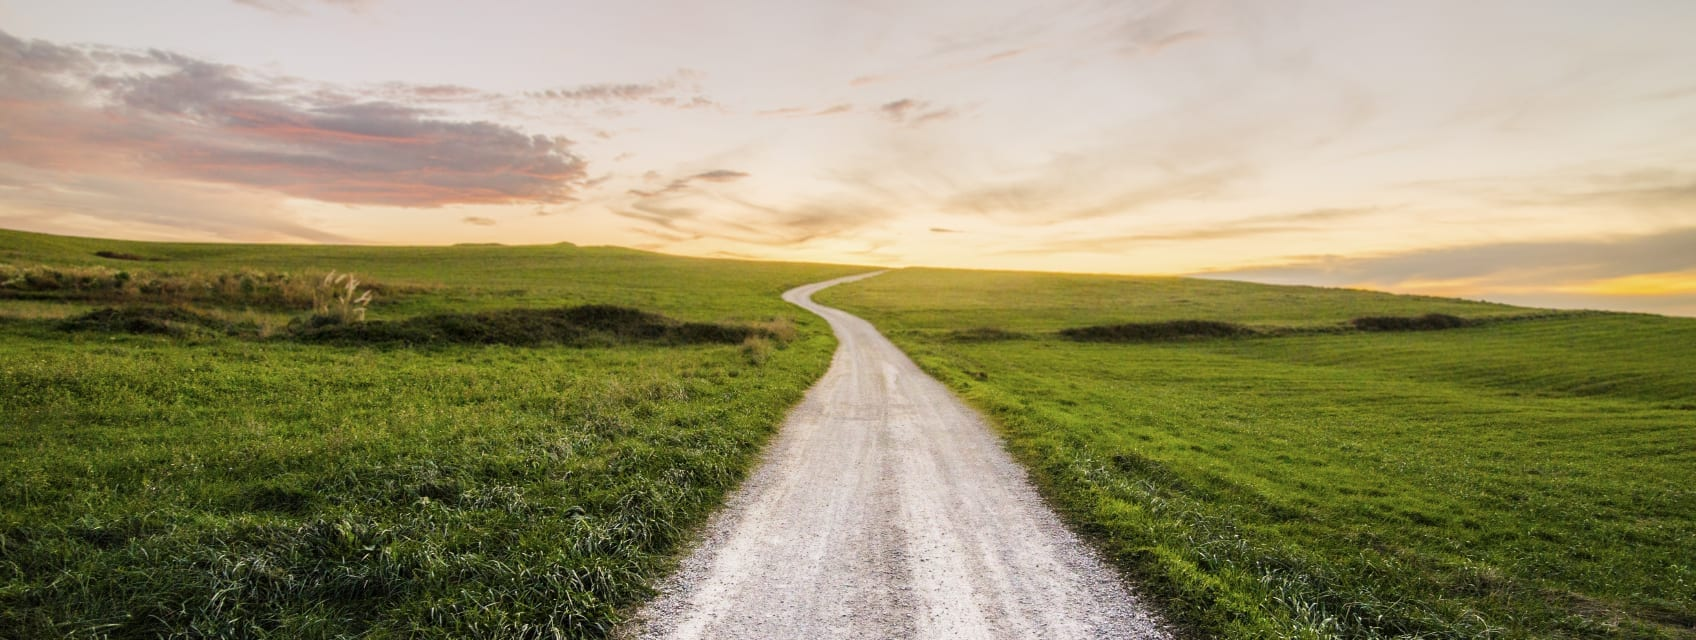 a dirt road through a grassy field to sunrise